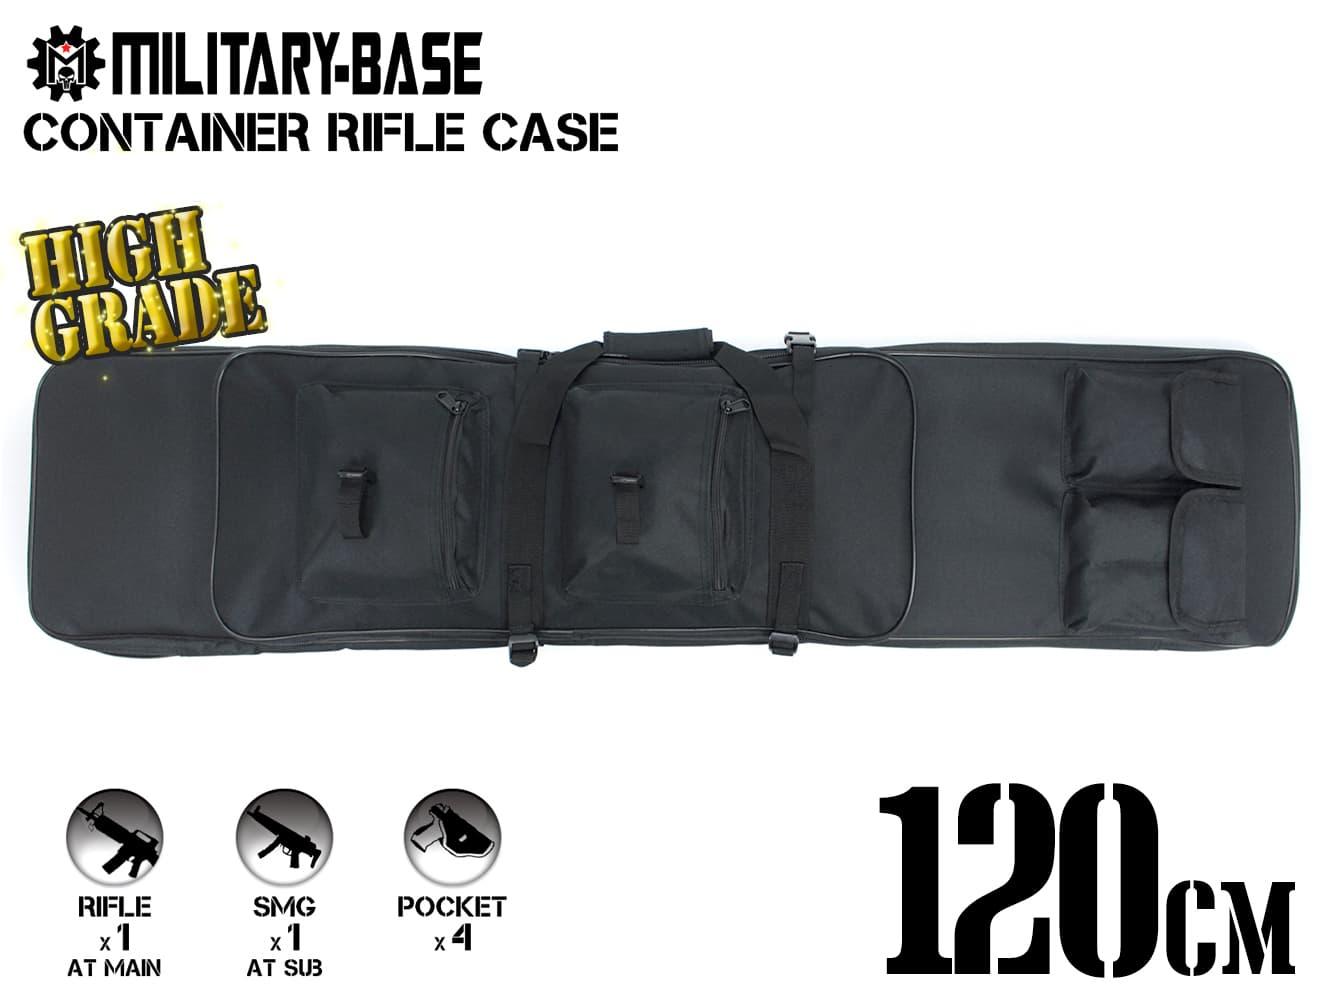 MILITARY-BASE(ミリタリーベース)120cm コンテナライフルケース HG/BK◆ロングガンケース ハイグレードタイプ 質感耐久性アップ M40 M700 L96 VSR-10等狙撃銃に